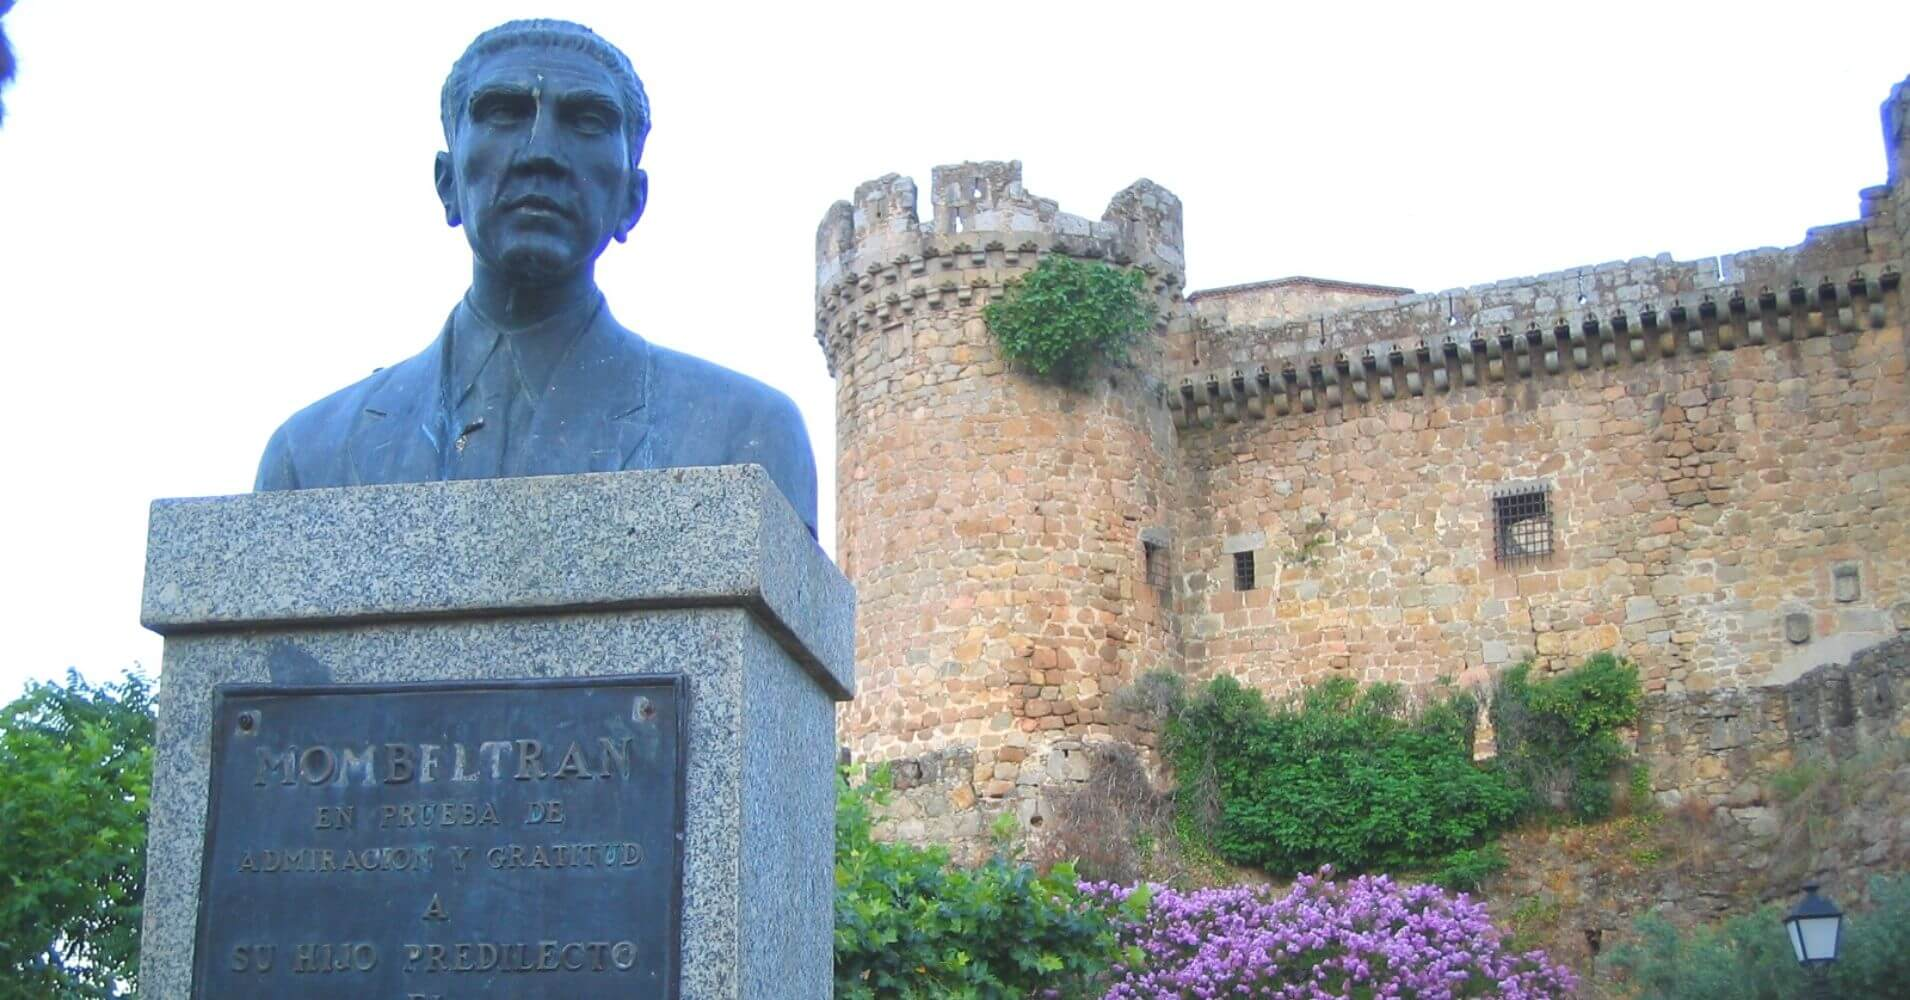 Mombeltrán. Ávila, Castilla y León.